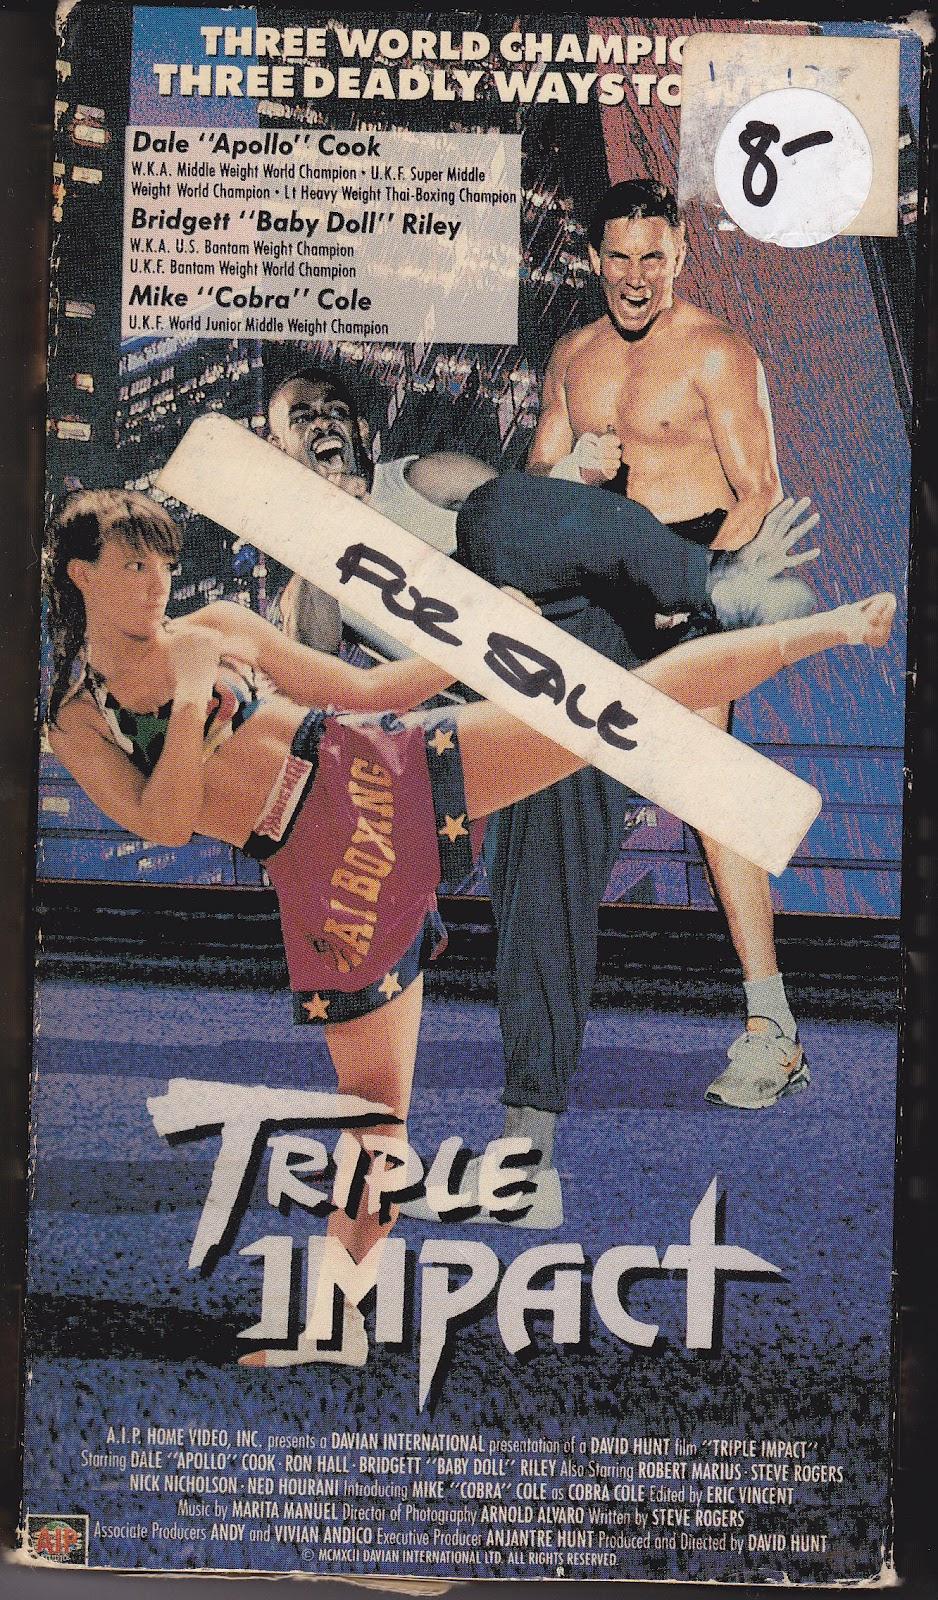 img - Triple Impact (1992)